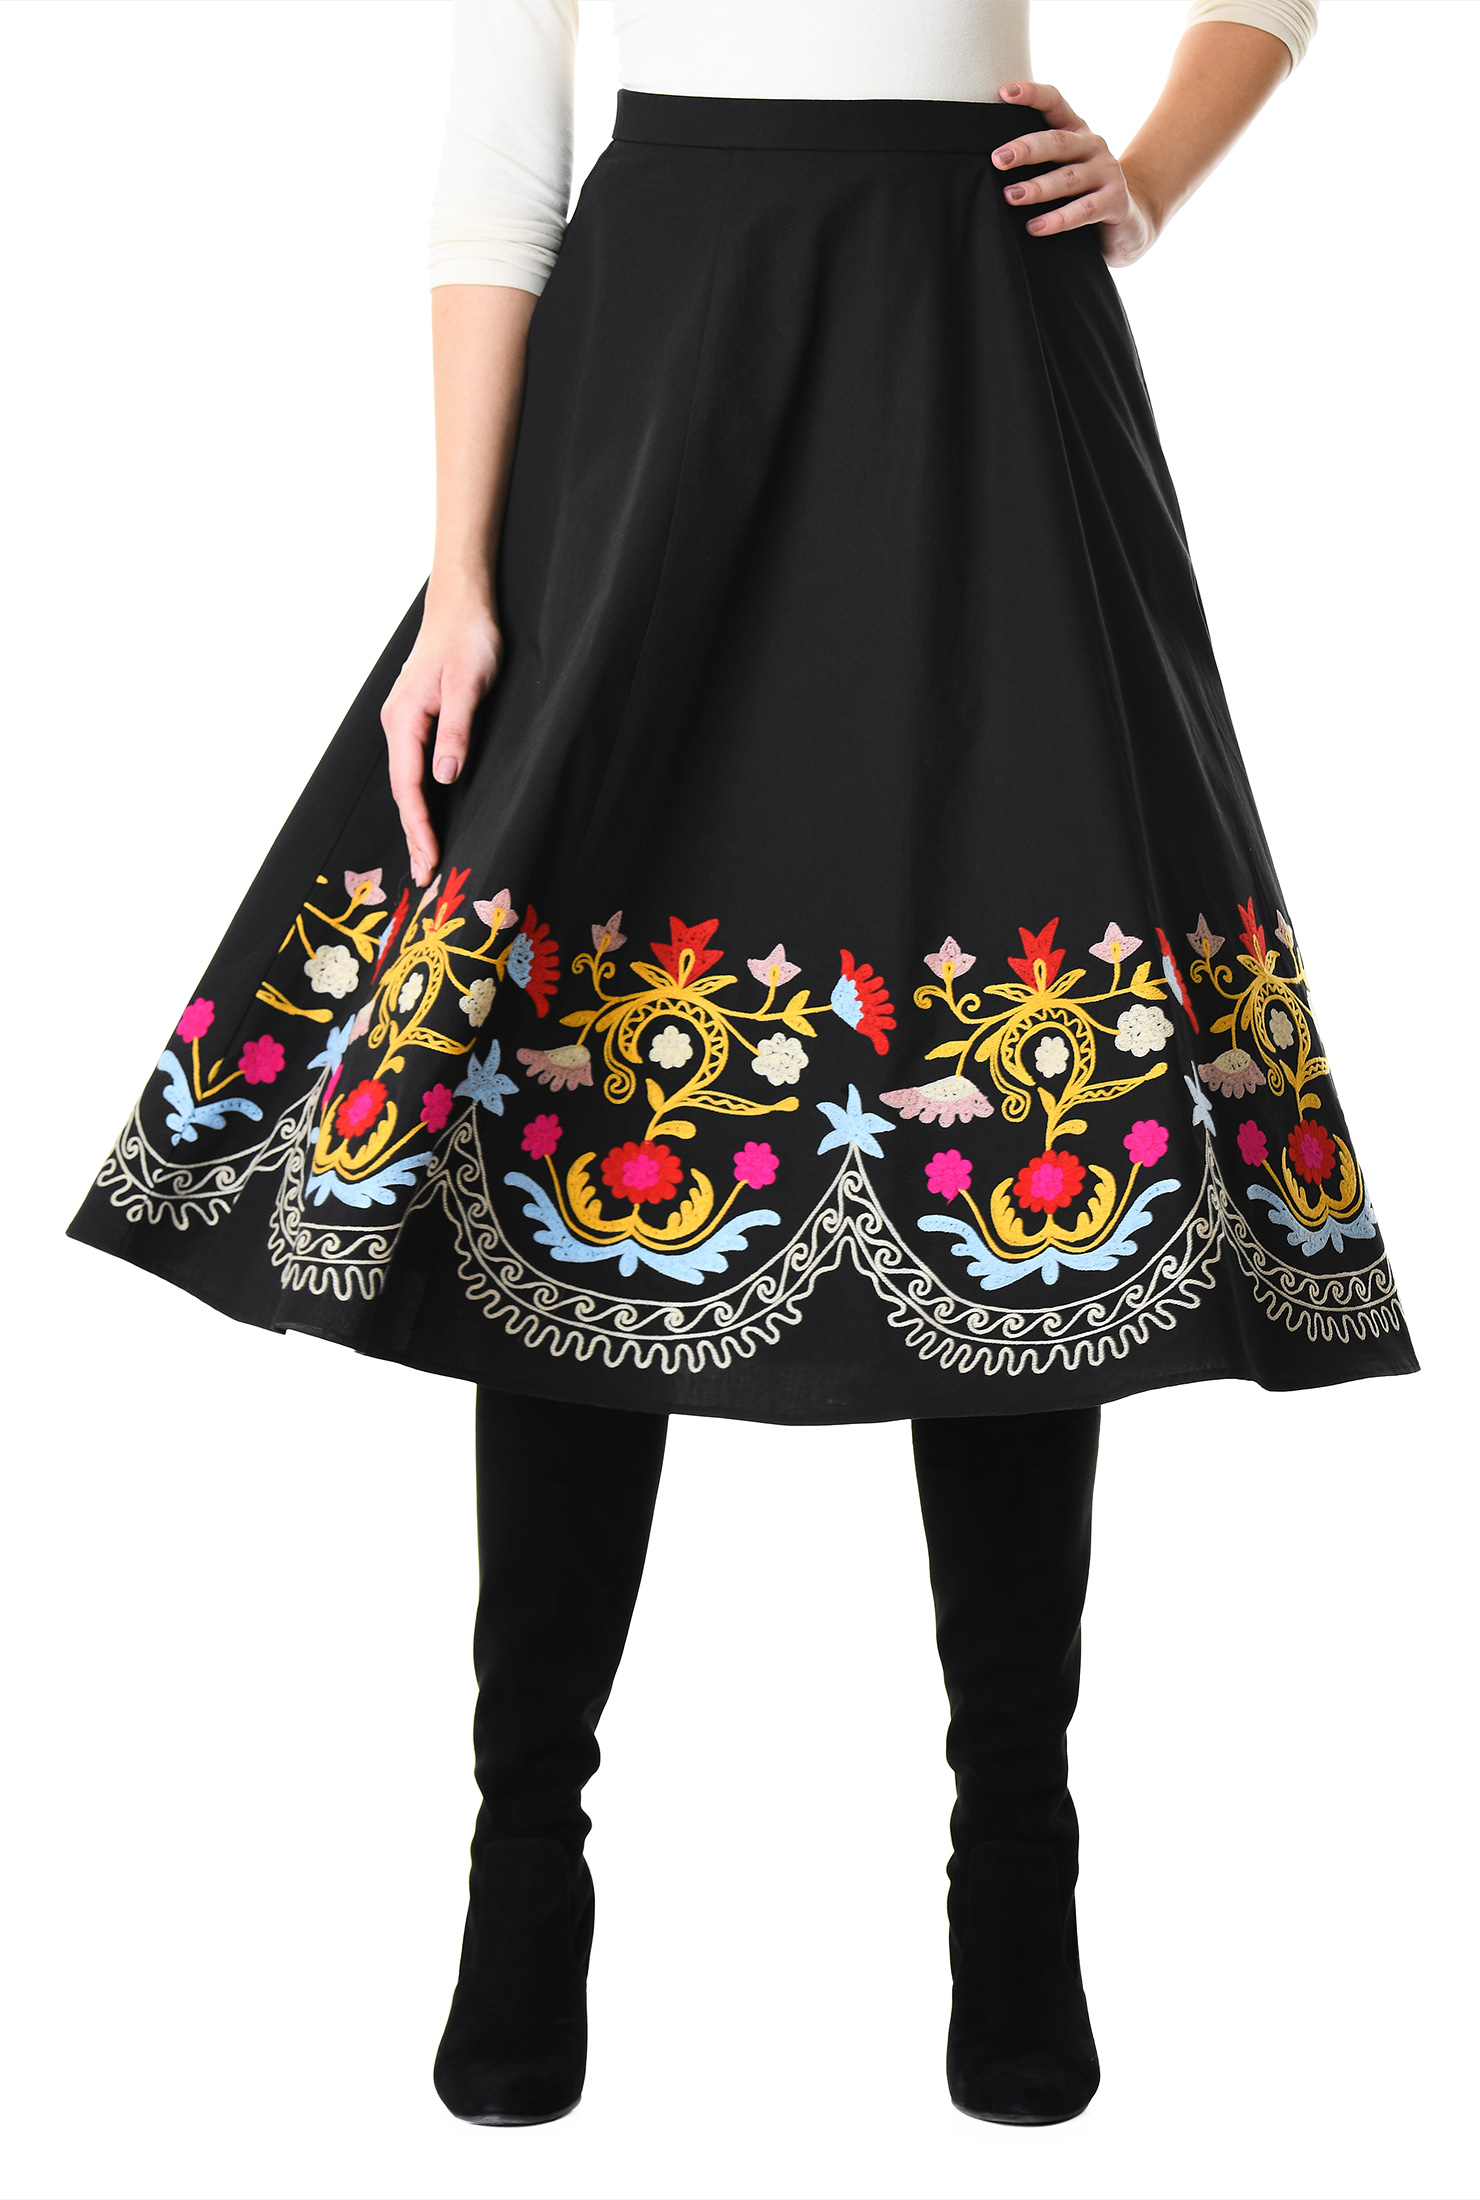 Womens Fashion Clothing 0 36w And Custom Petal Skirt Black Back Zip Skirts Banded Waist Multi Cotton Spandex